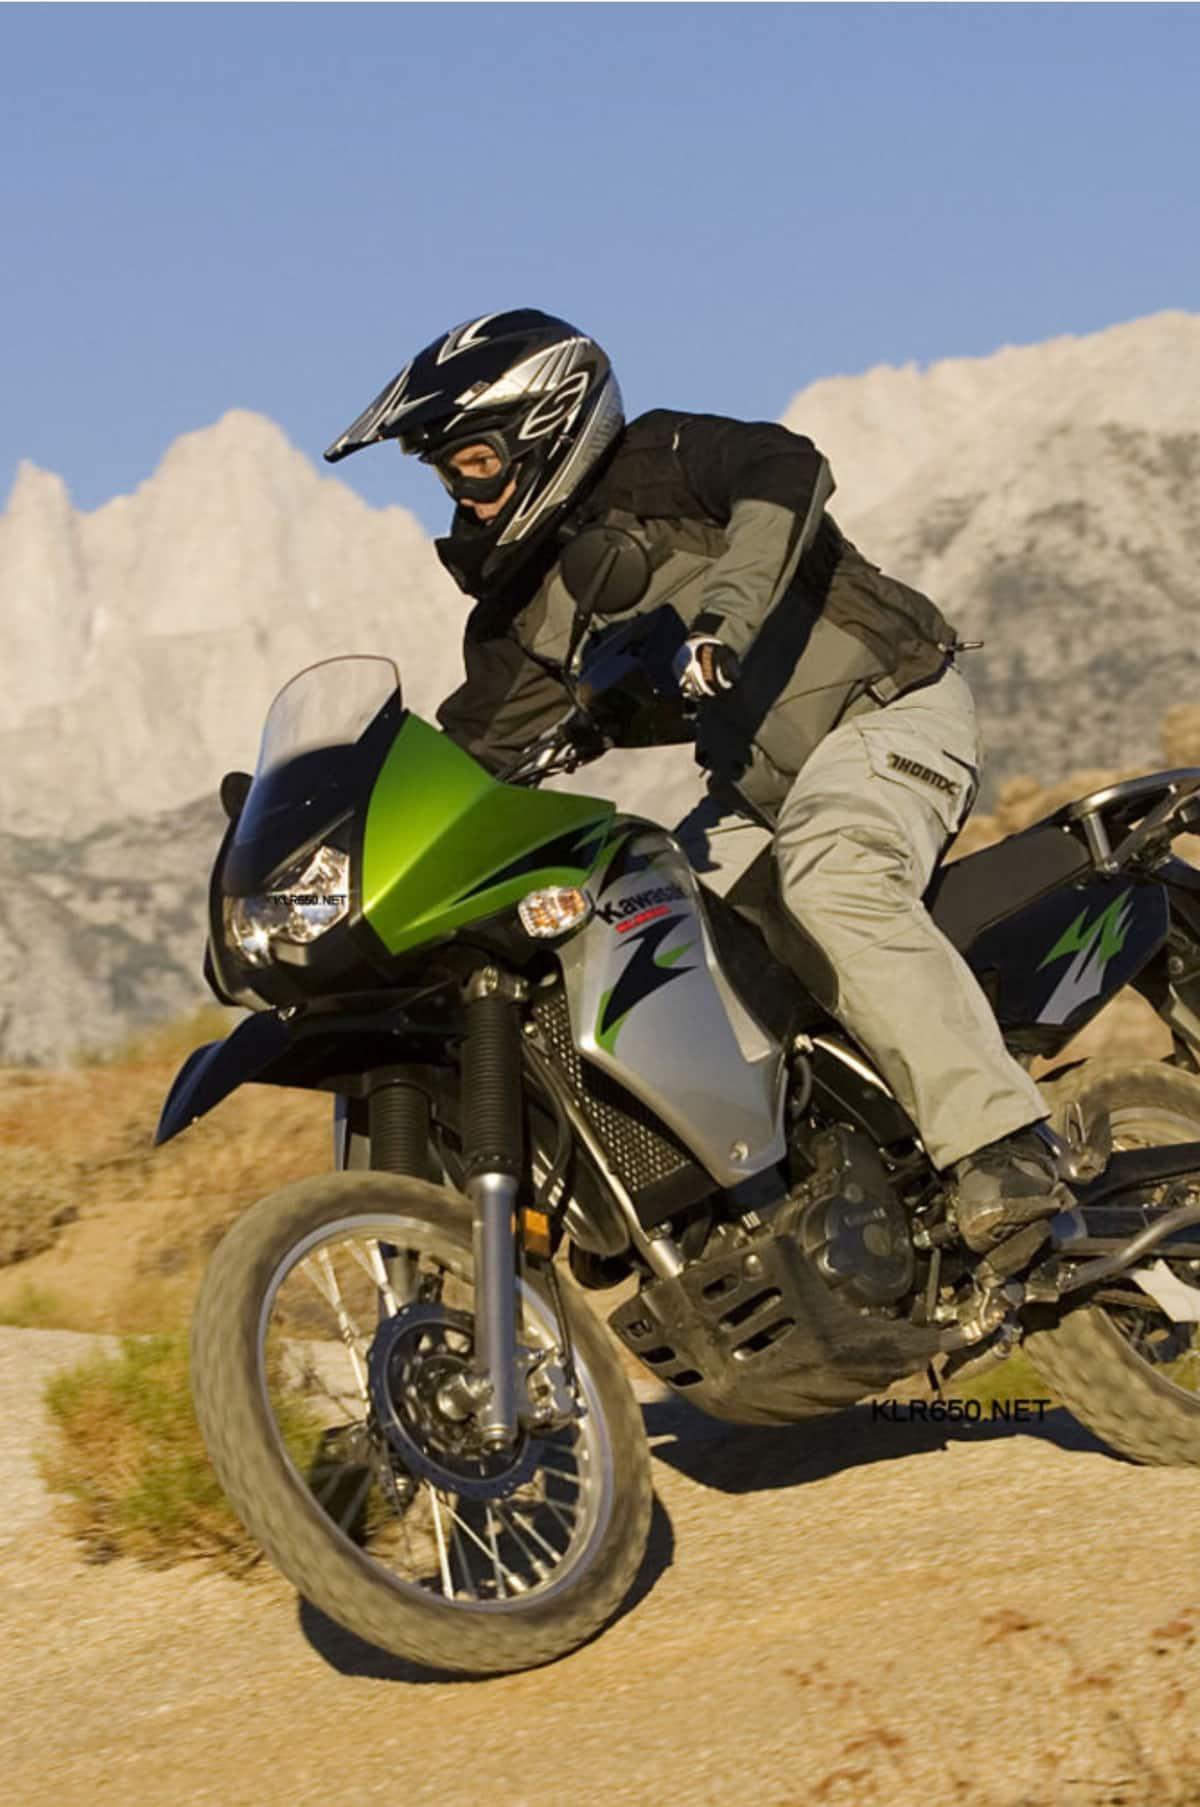 Man on motorcycle in desert